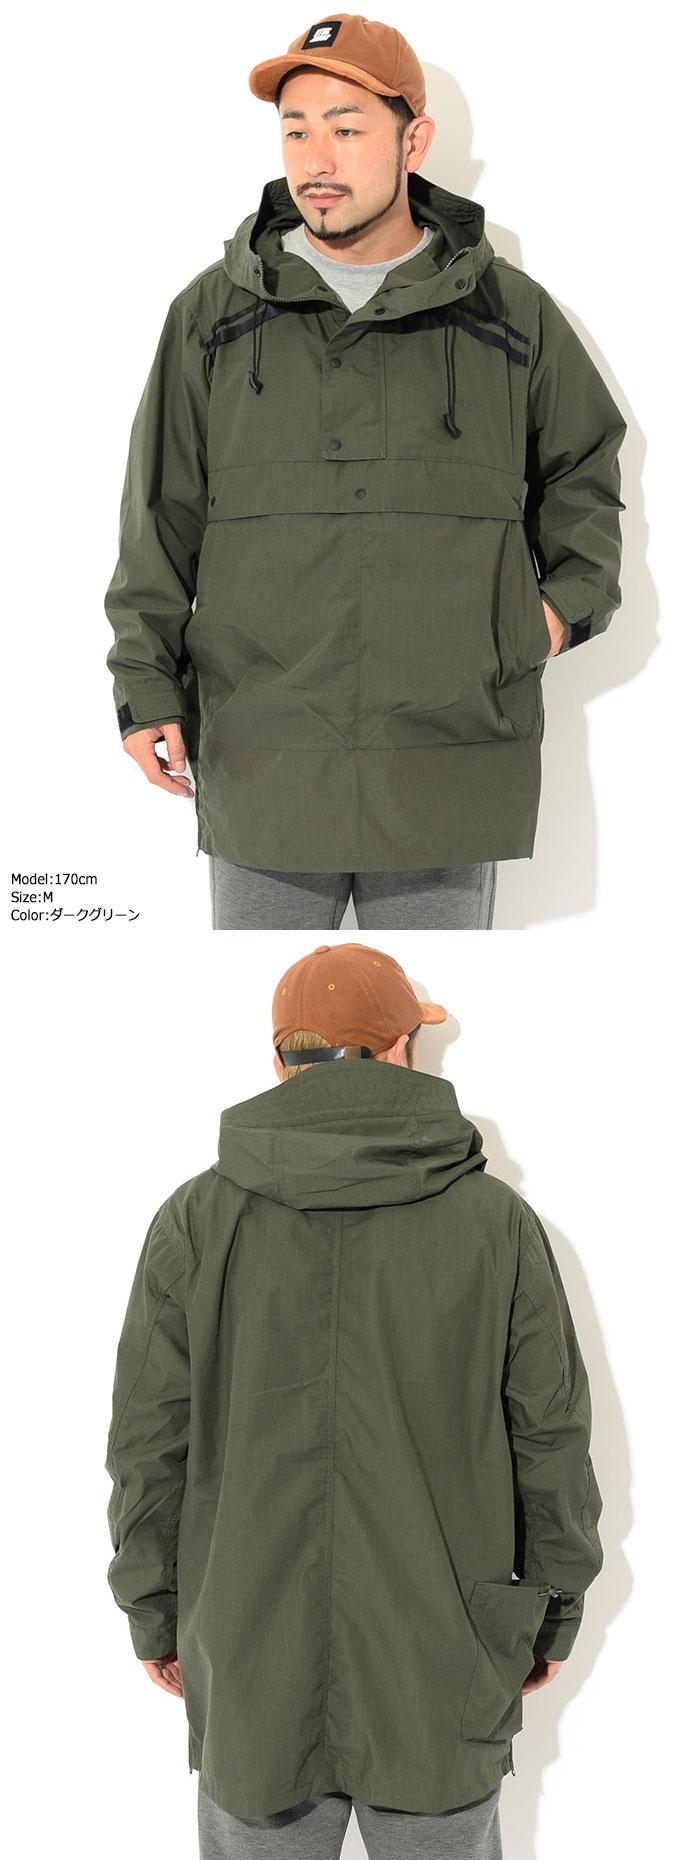 NANGAナンガのジャケット Takibi Field Anorak Parka03